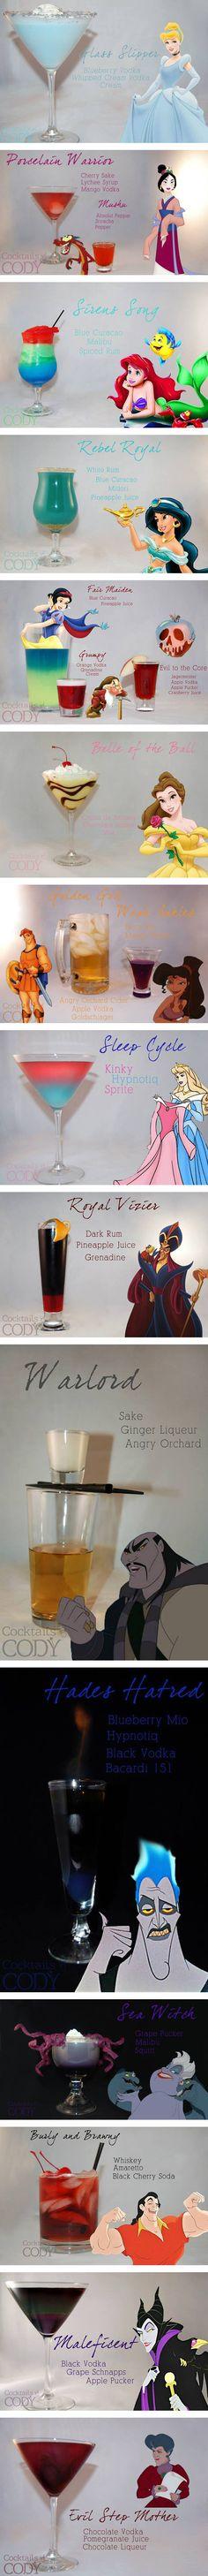 disney drink, disney parties, disney princesses, disney princess cocktails, disney princess drinks